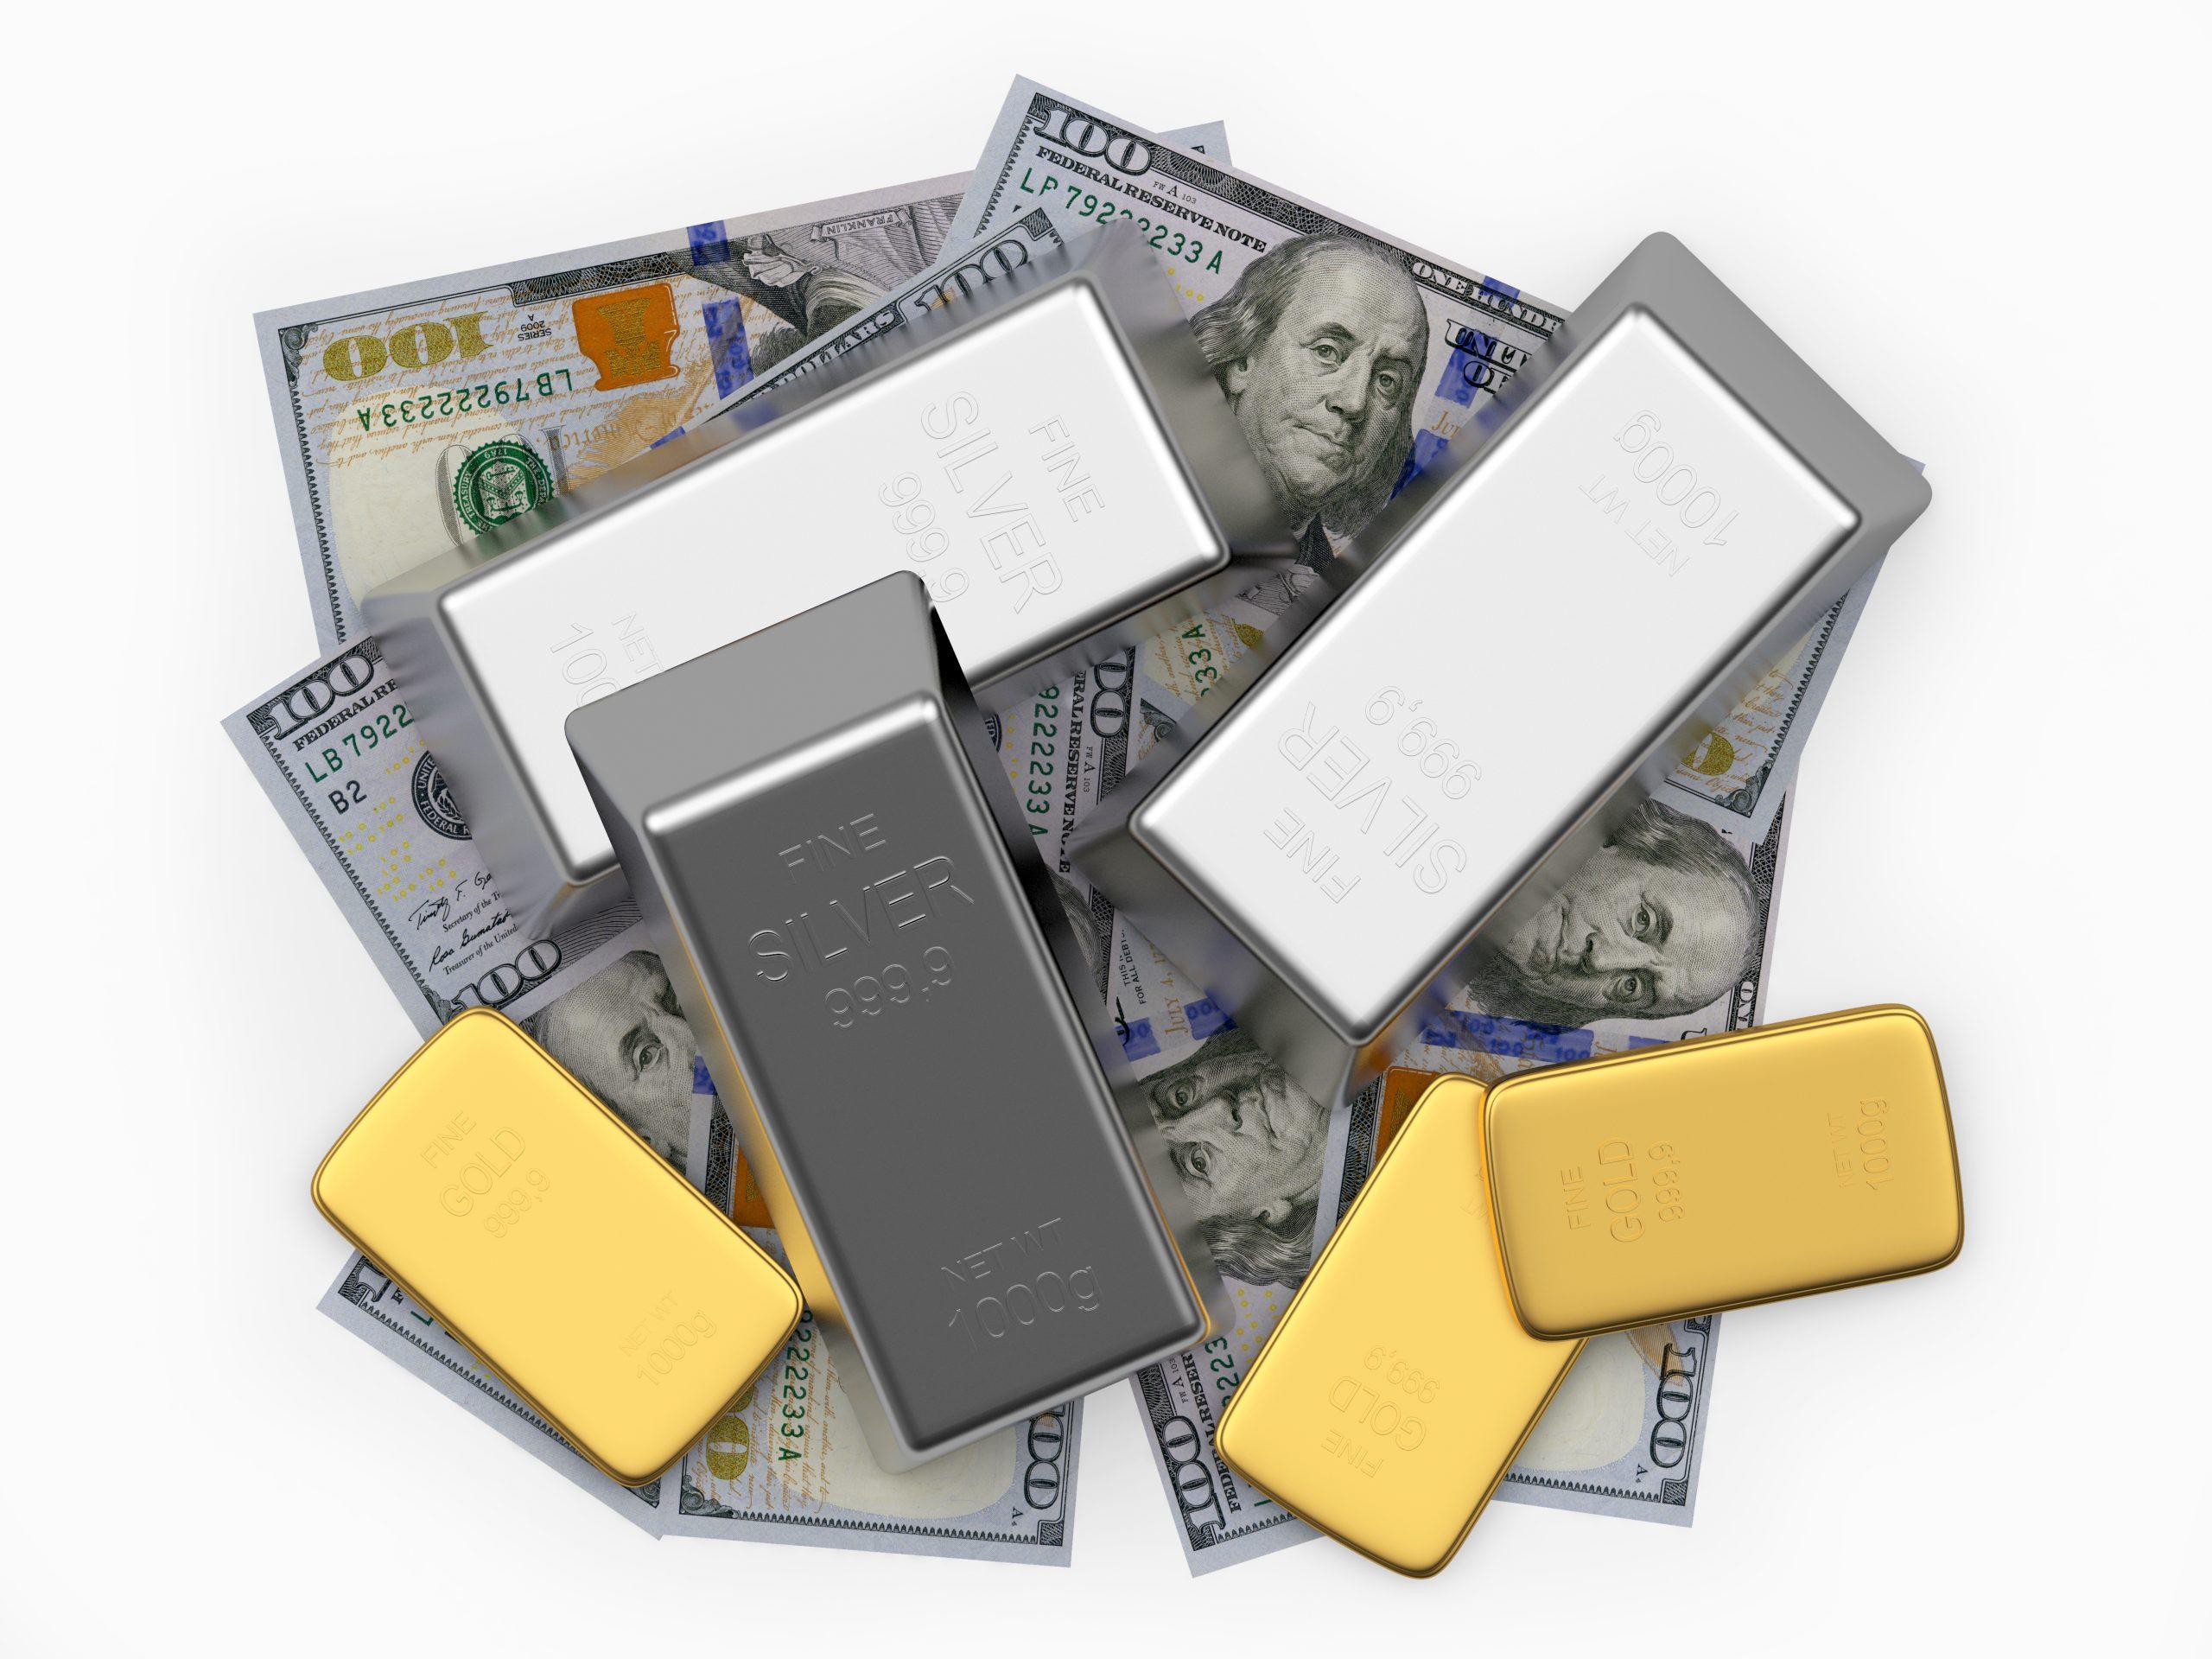 Dental Scrap and Jewelry Refiner Exchange